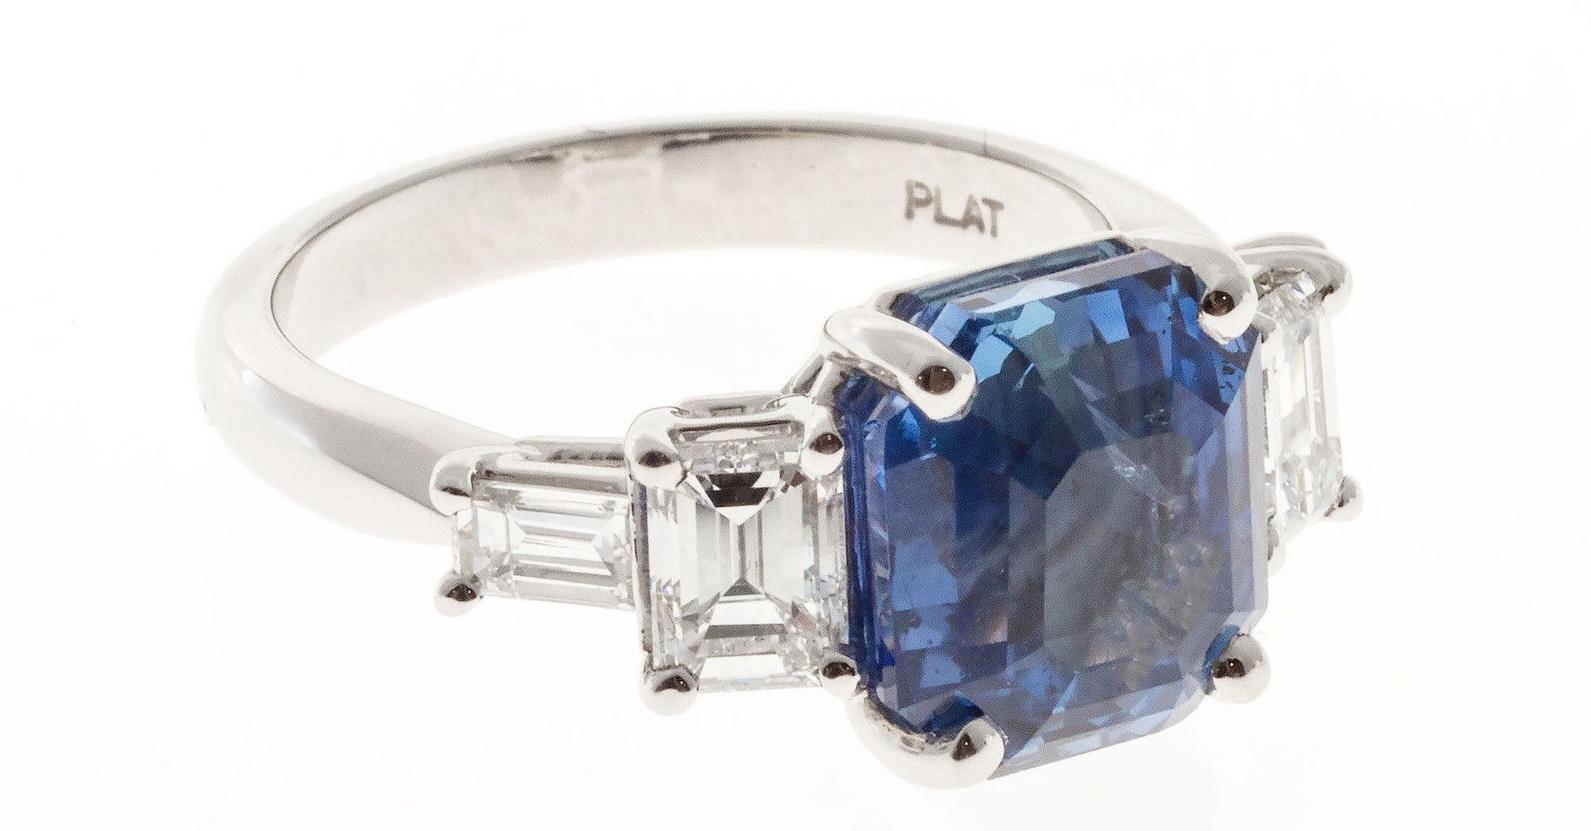 Natural Emerald Cut Sapphire Diamond Engagement Ring Platinum